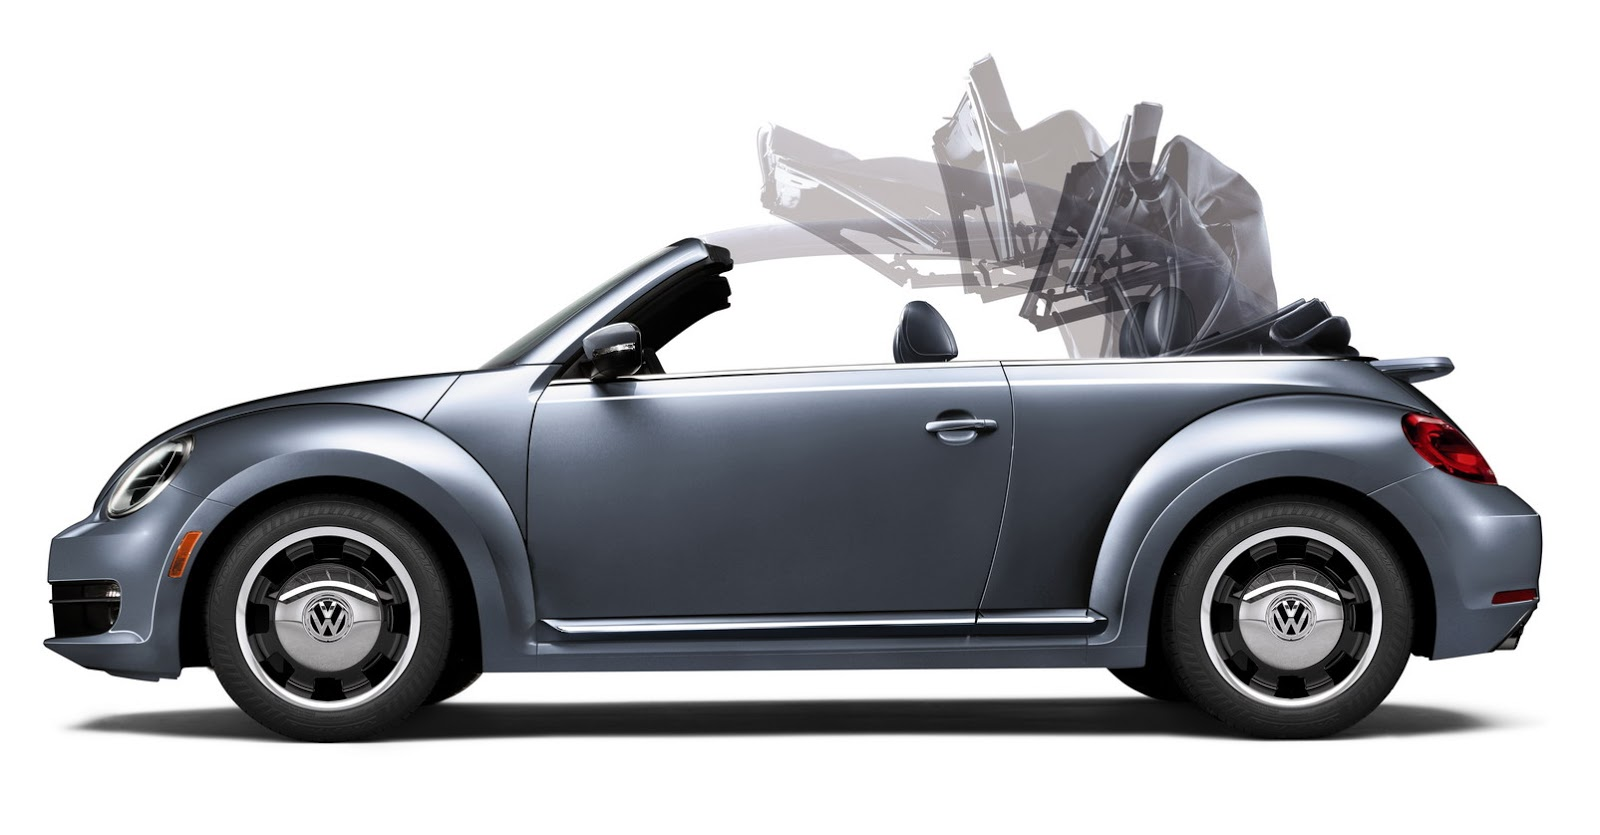 2016 volkswagen beetle convertible denim edition image 456288. Black Bedroom Furniture Sets. Home Design Ideas